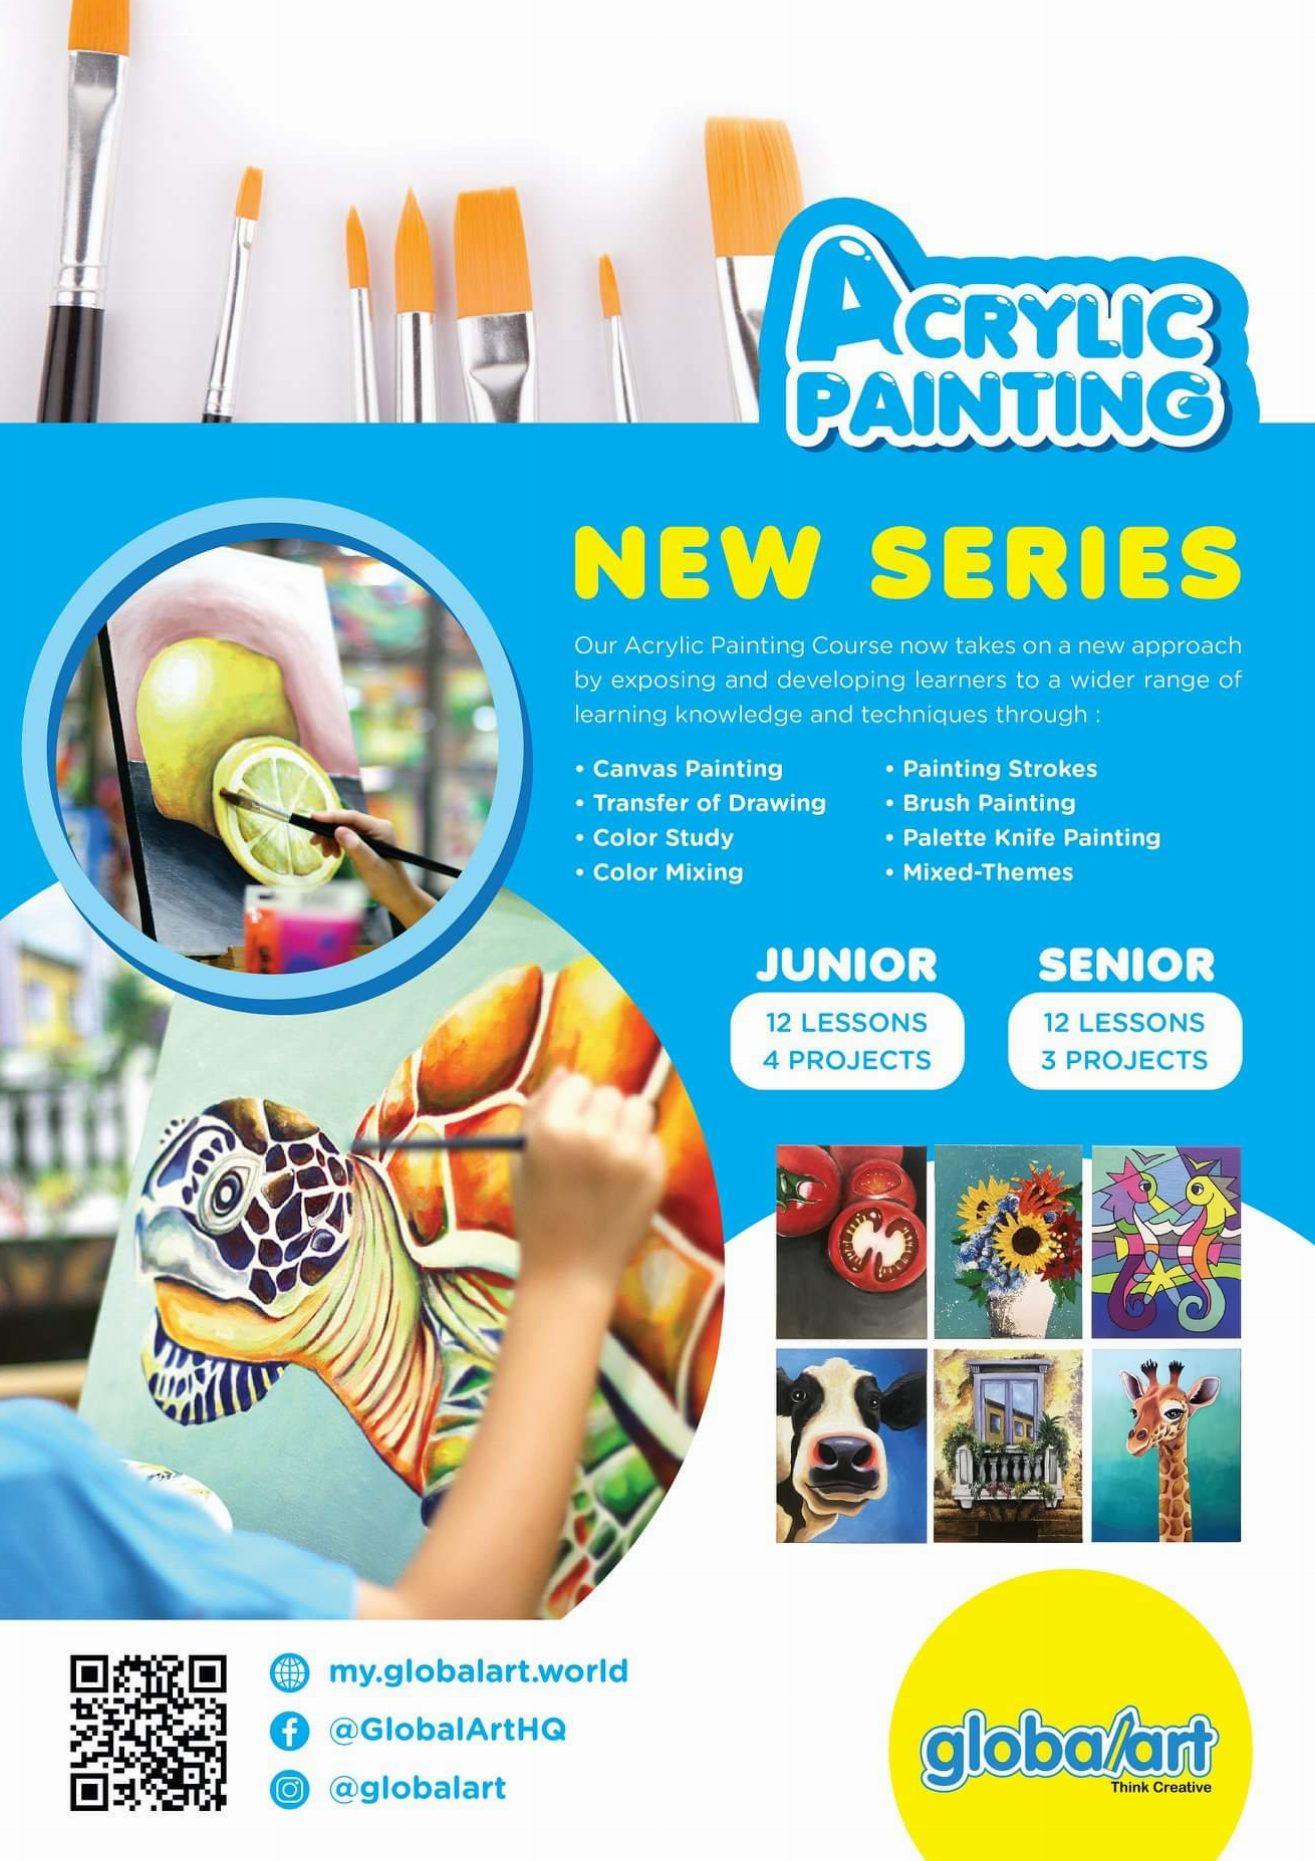 2019 New Series of Acrylic Painting (Junior & Senior)